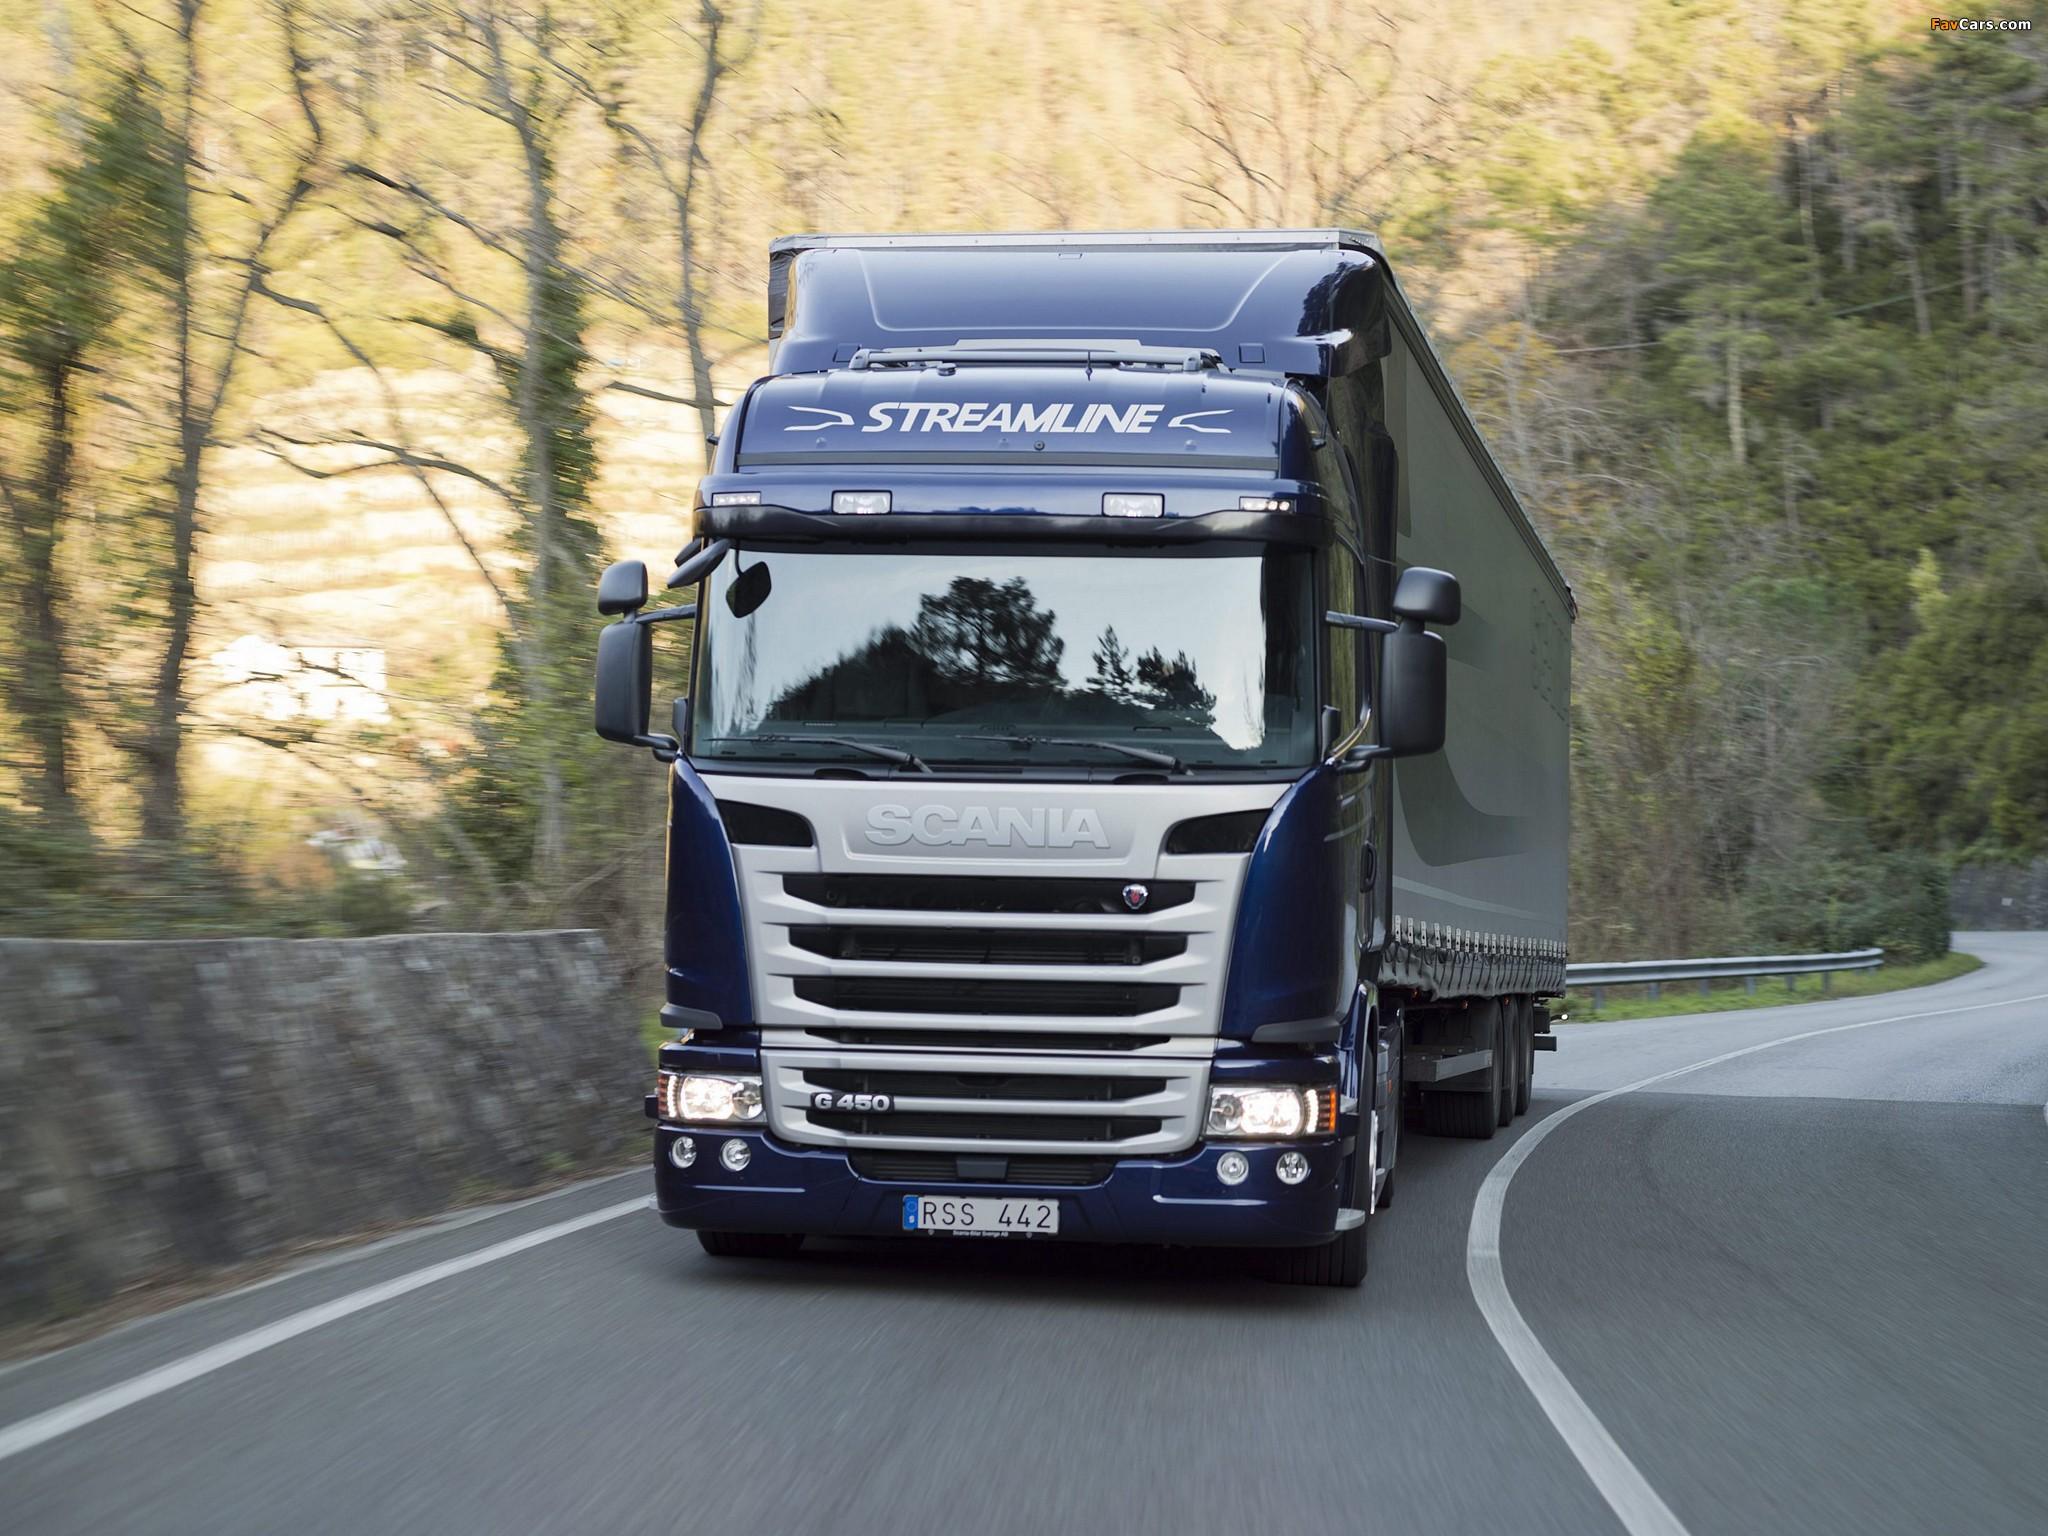 Scania G450 4x2 Streamline Highline Cab 2013 pictures (2048 x 1536)